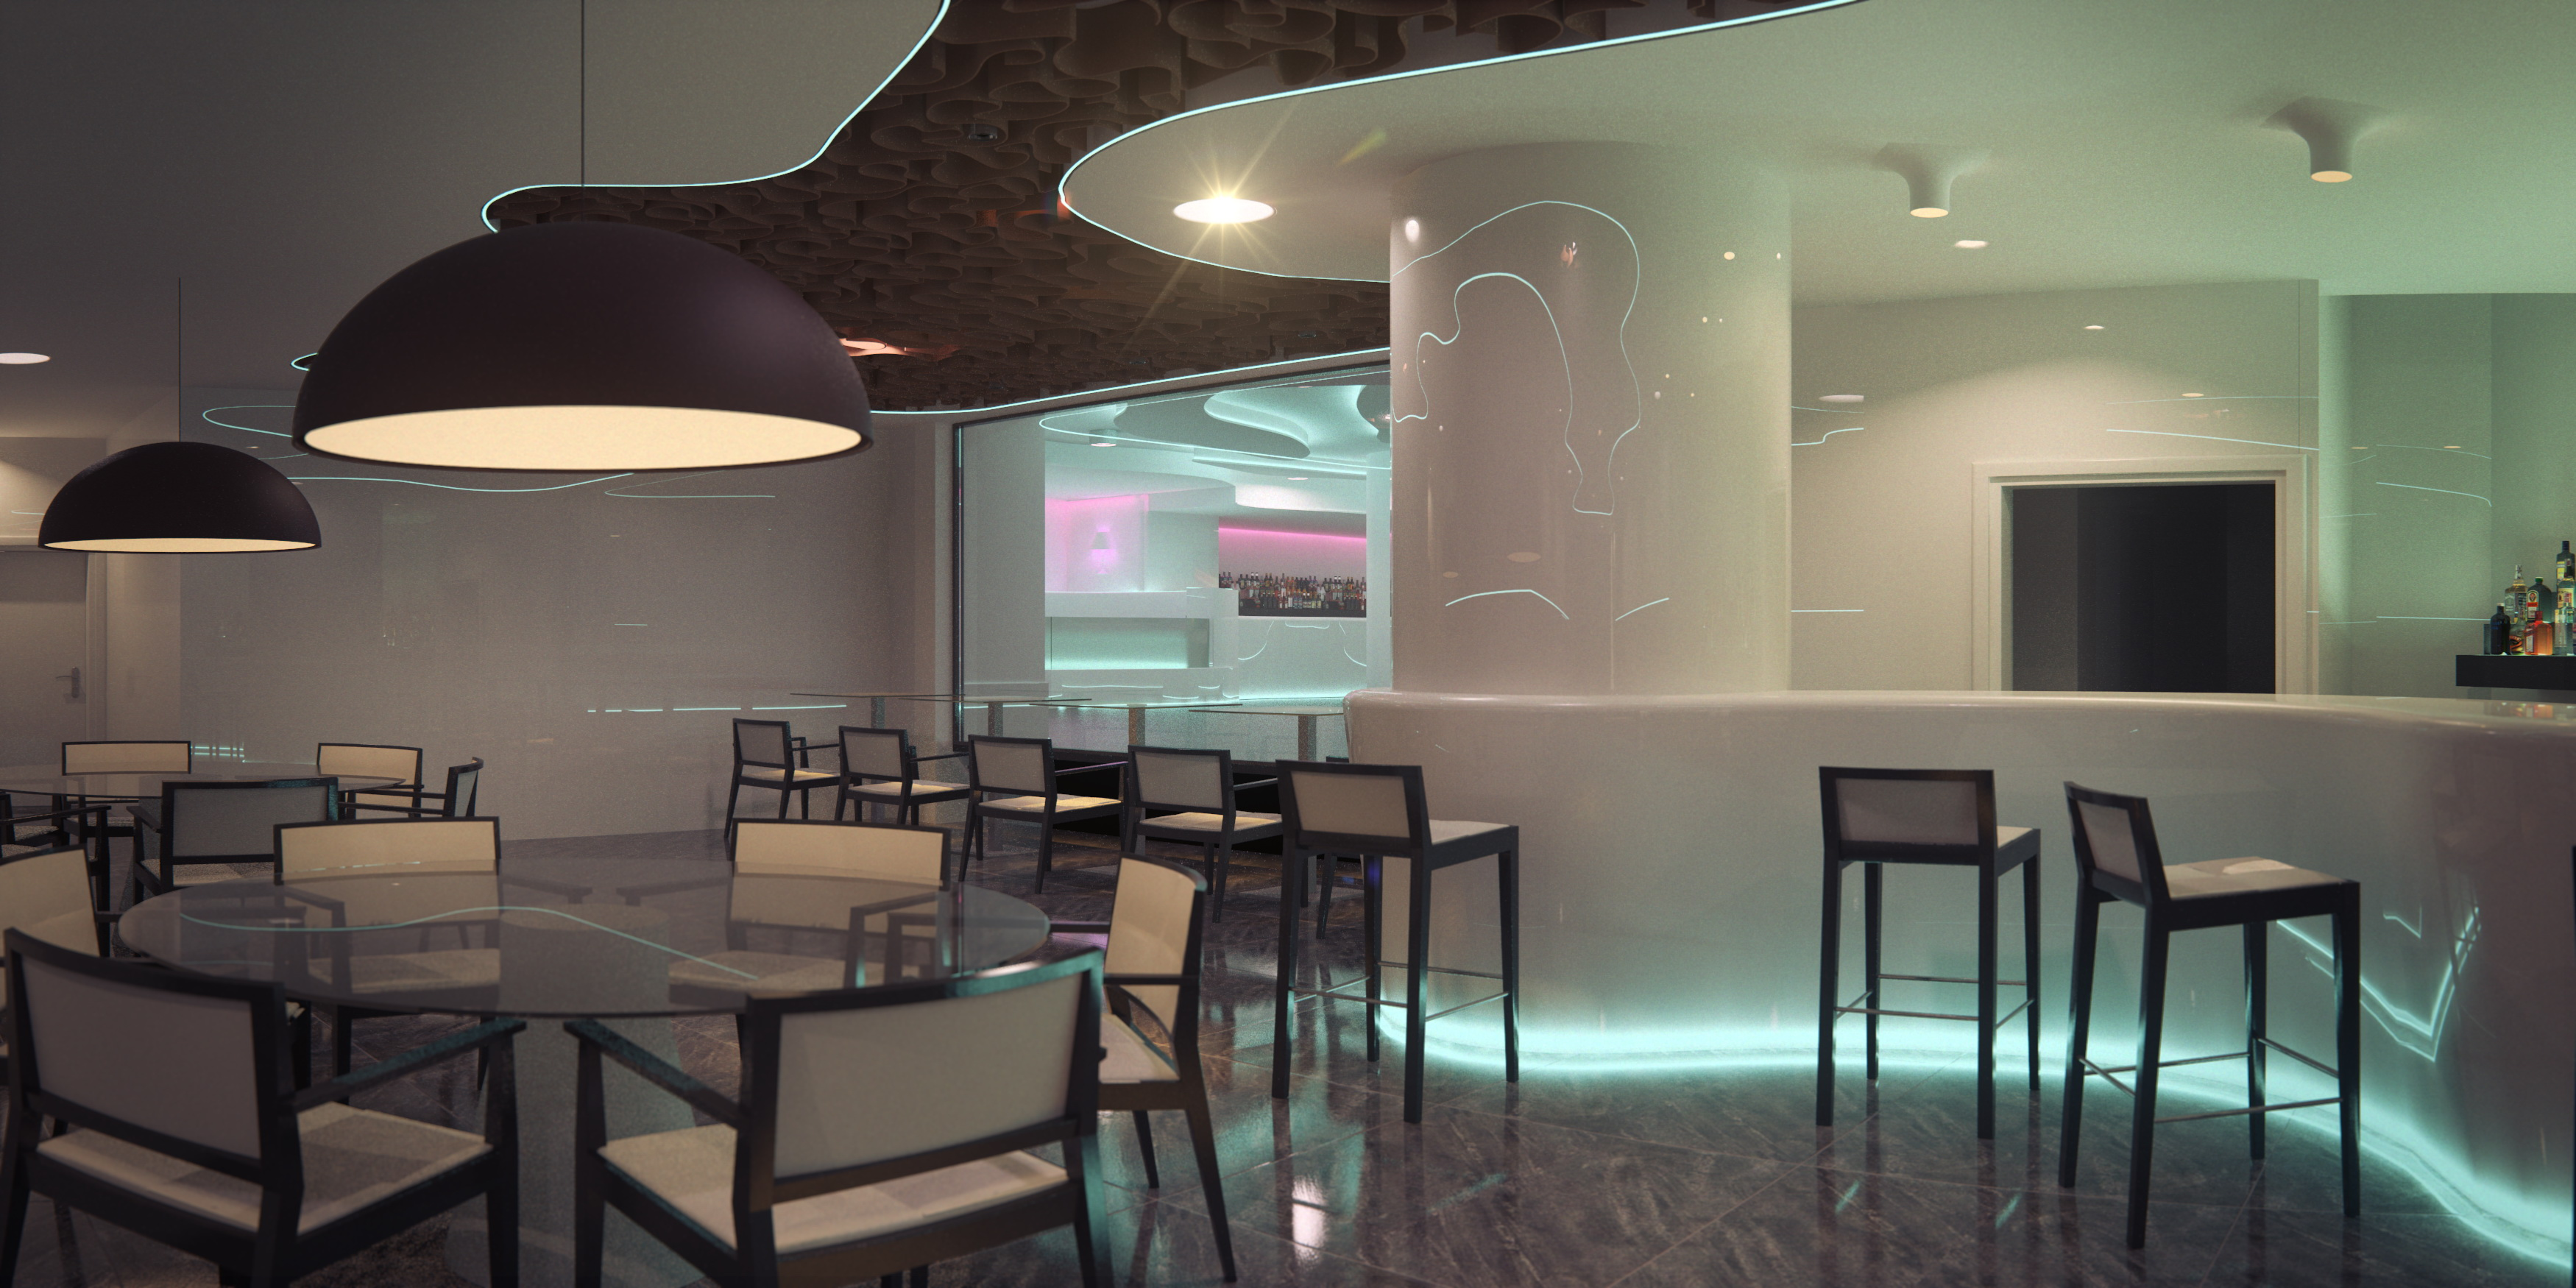 Interiorismo restaurante discoteca cuantico infografia for Interiorismo restaurantes